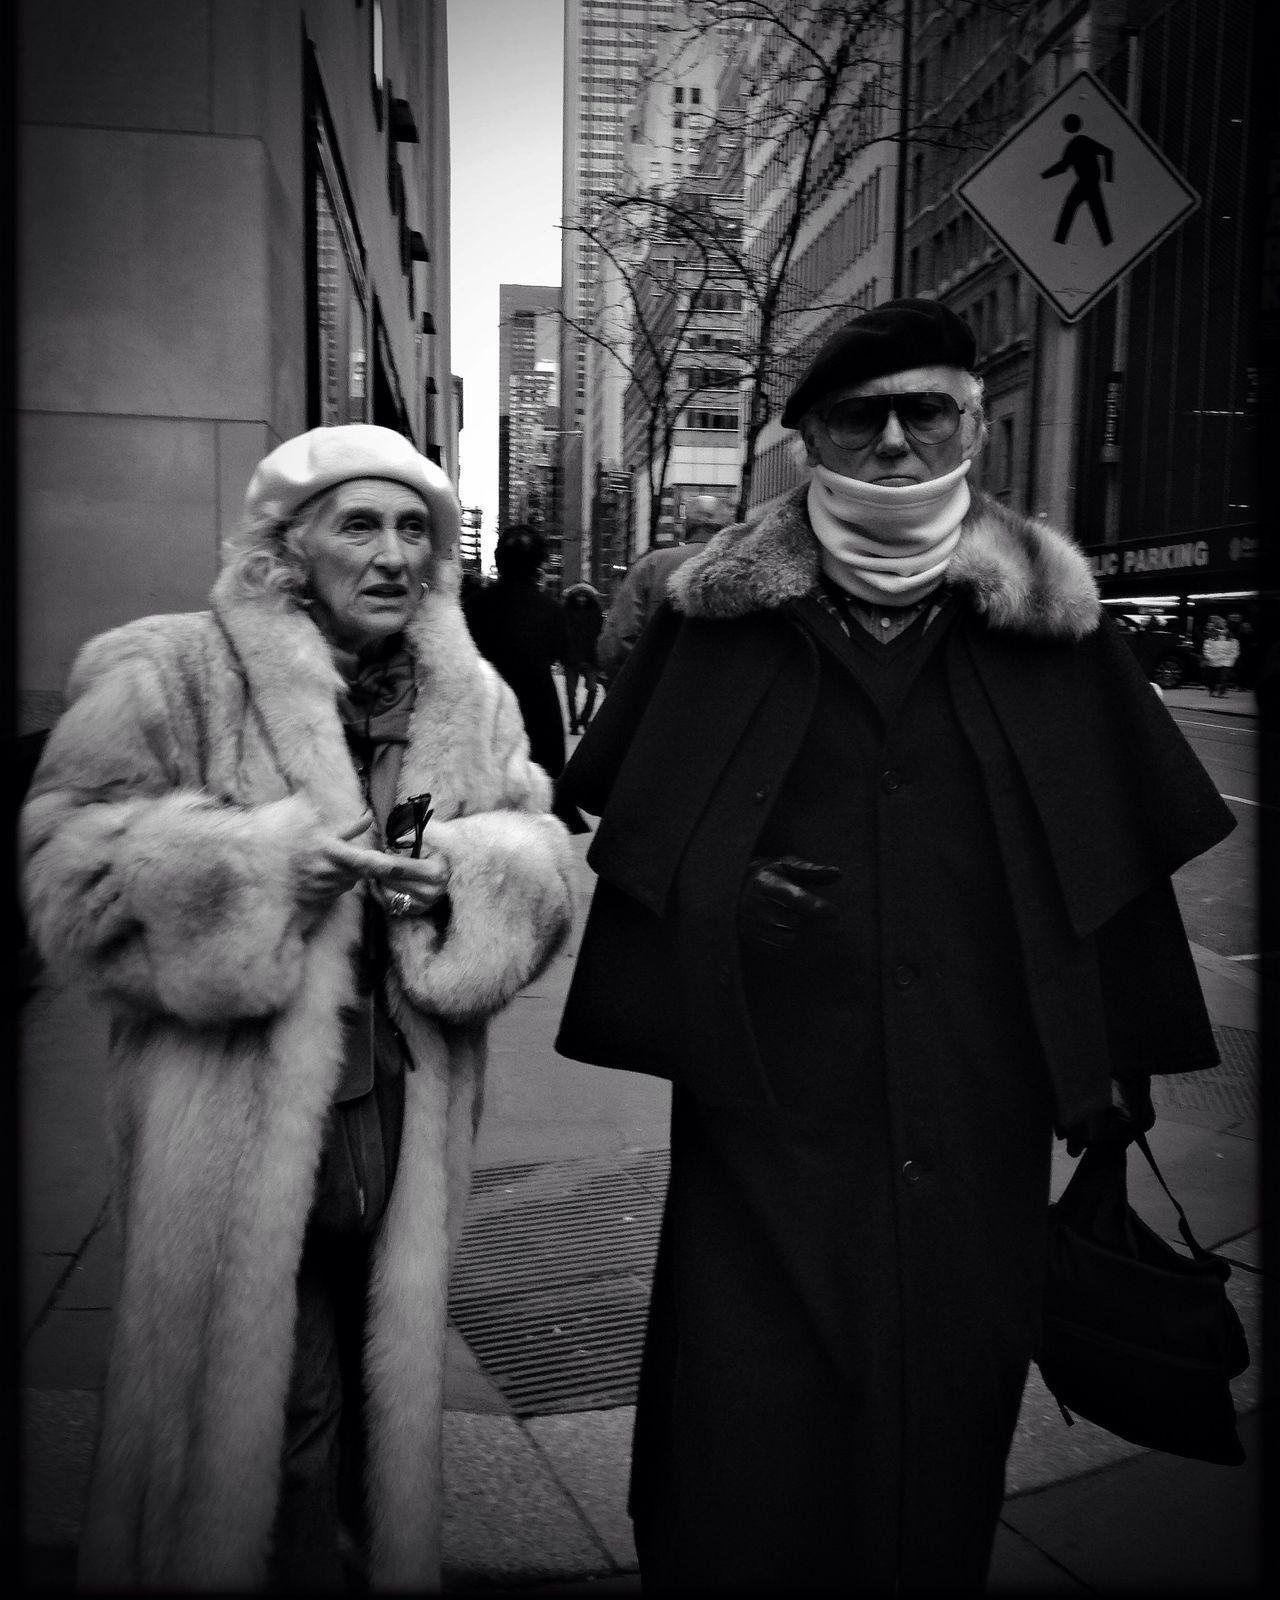 Rockefeller Center, NYC Street Life Blackandwhite Photography Hipstamatic New York City Wearegrryo AMPt_community Street Photography IPhoneography Eye4black&white  Street Fashion Candid